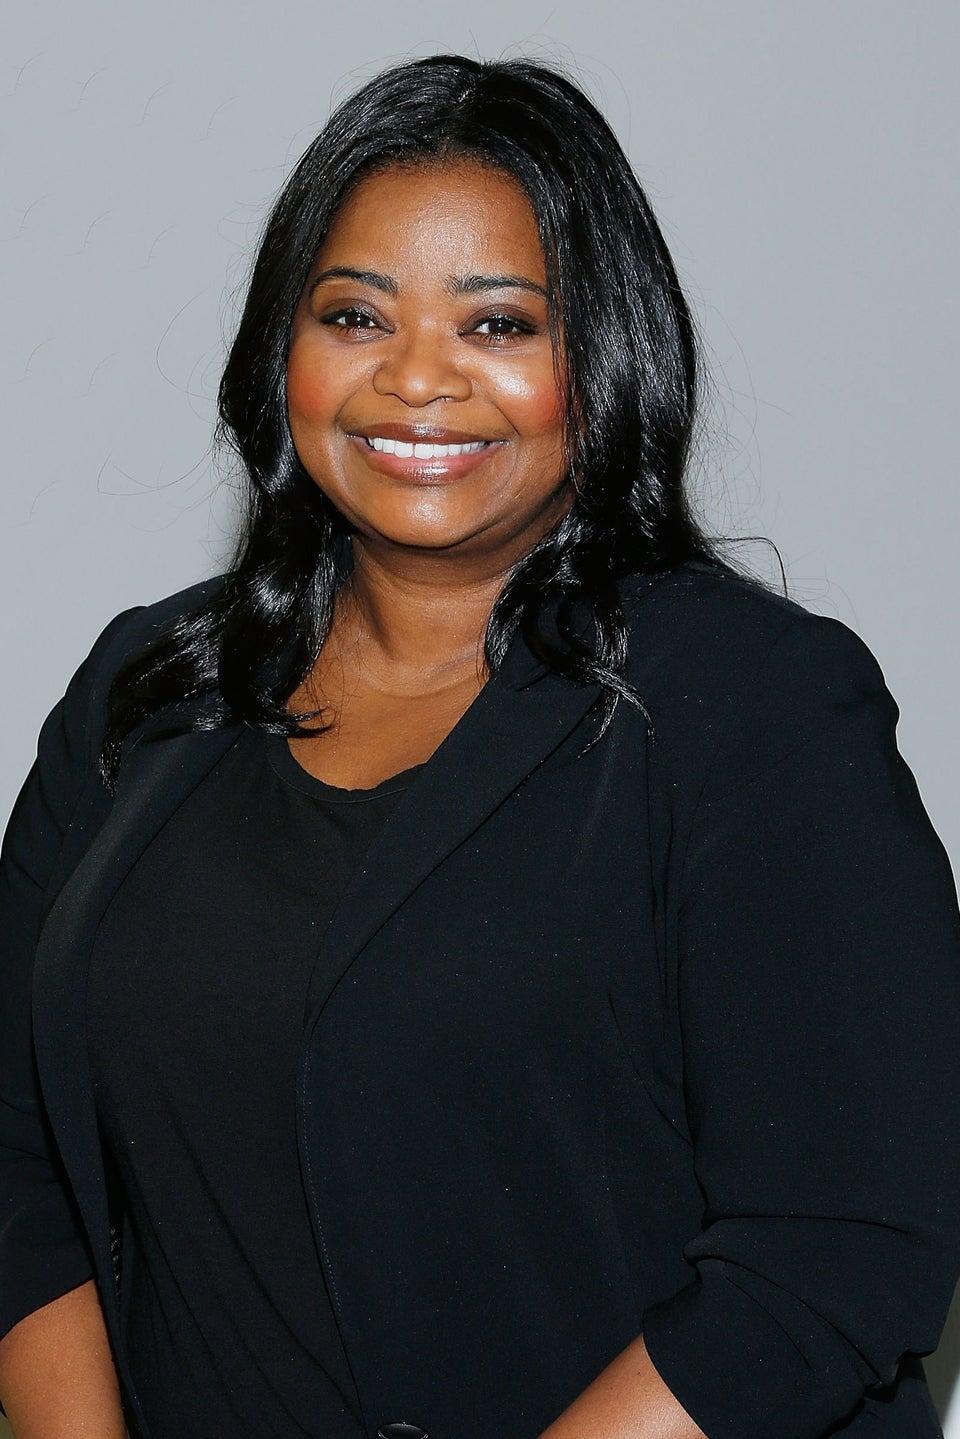 Netflix Announces New Madam C.J. Walker Series Executive Produced By Octavia Spencer and LeBron James